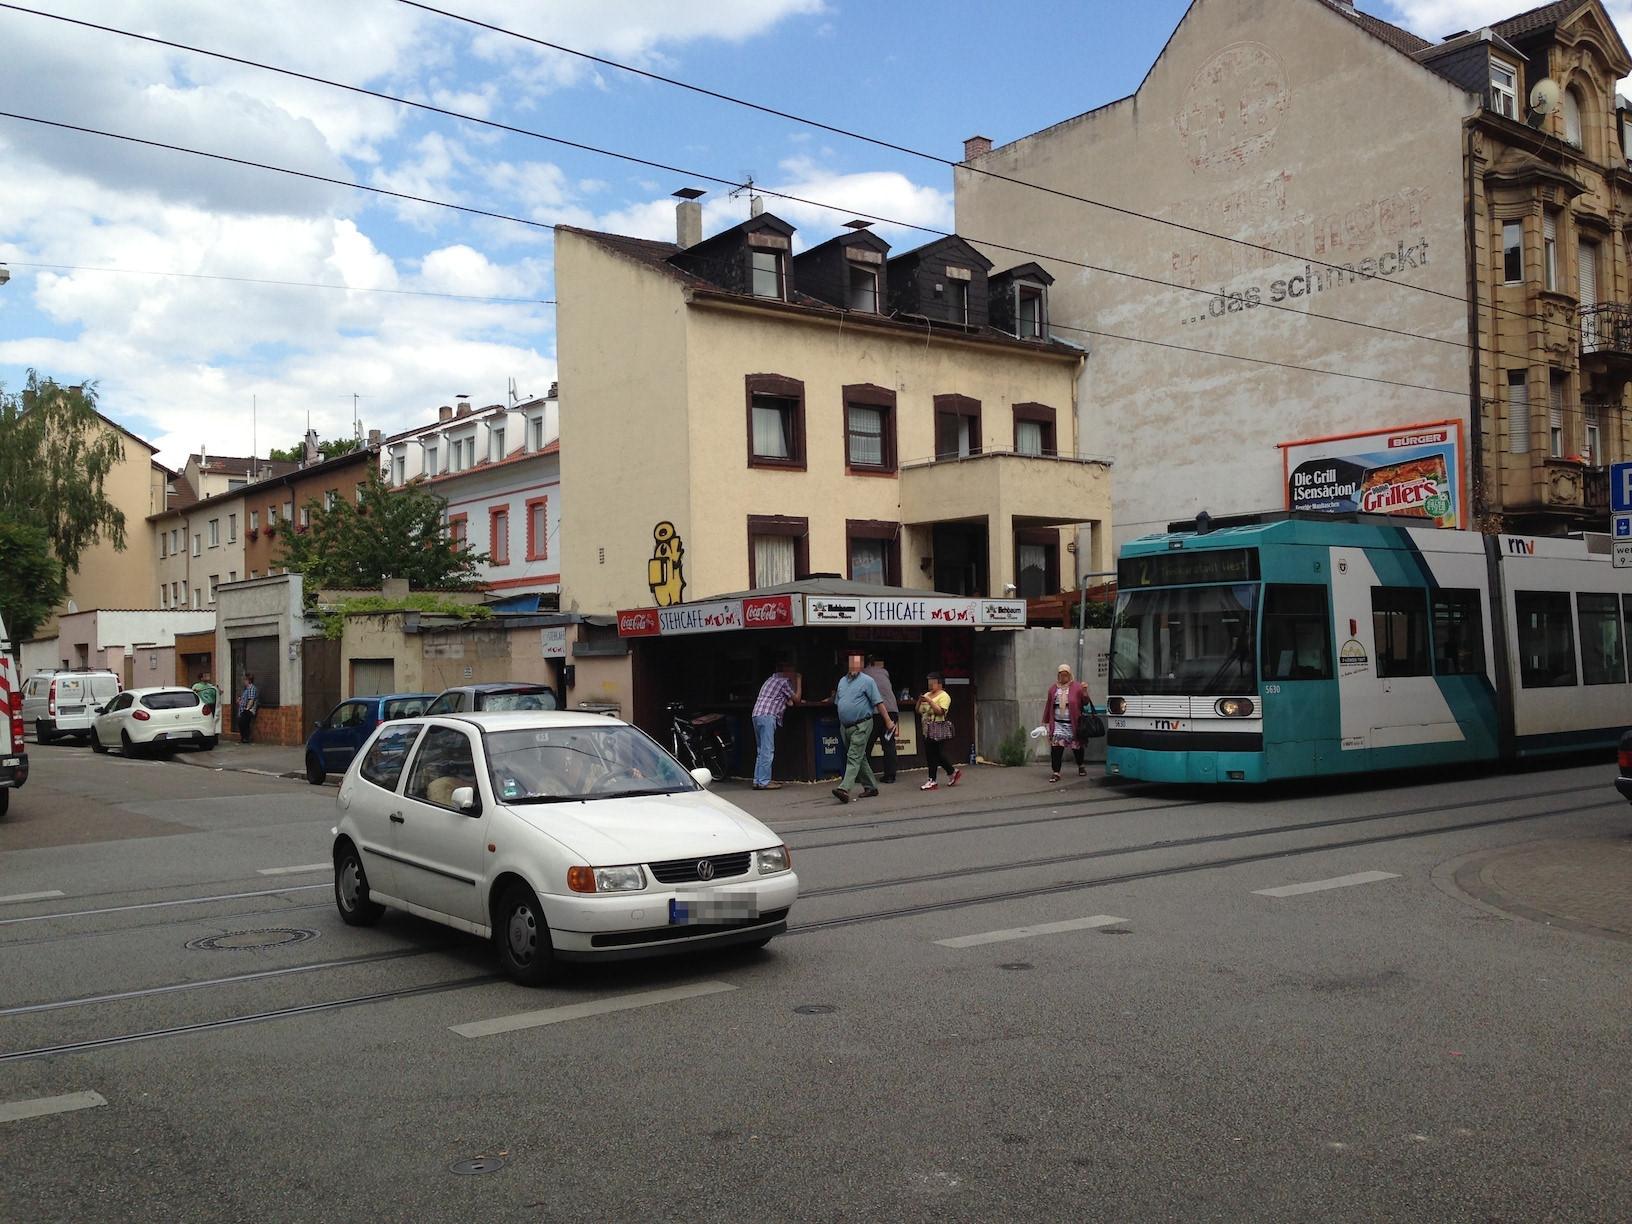 Die Kreuzung Bürgermeister-Fuchs-Straße/Mittelstraße | Foto: Neckarstadtblog